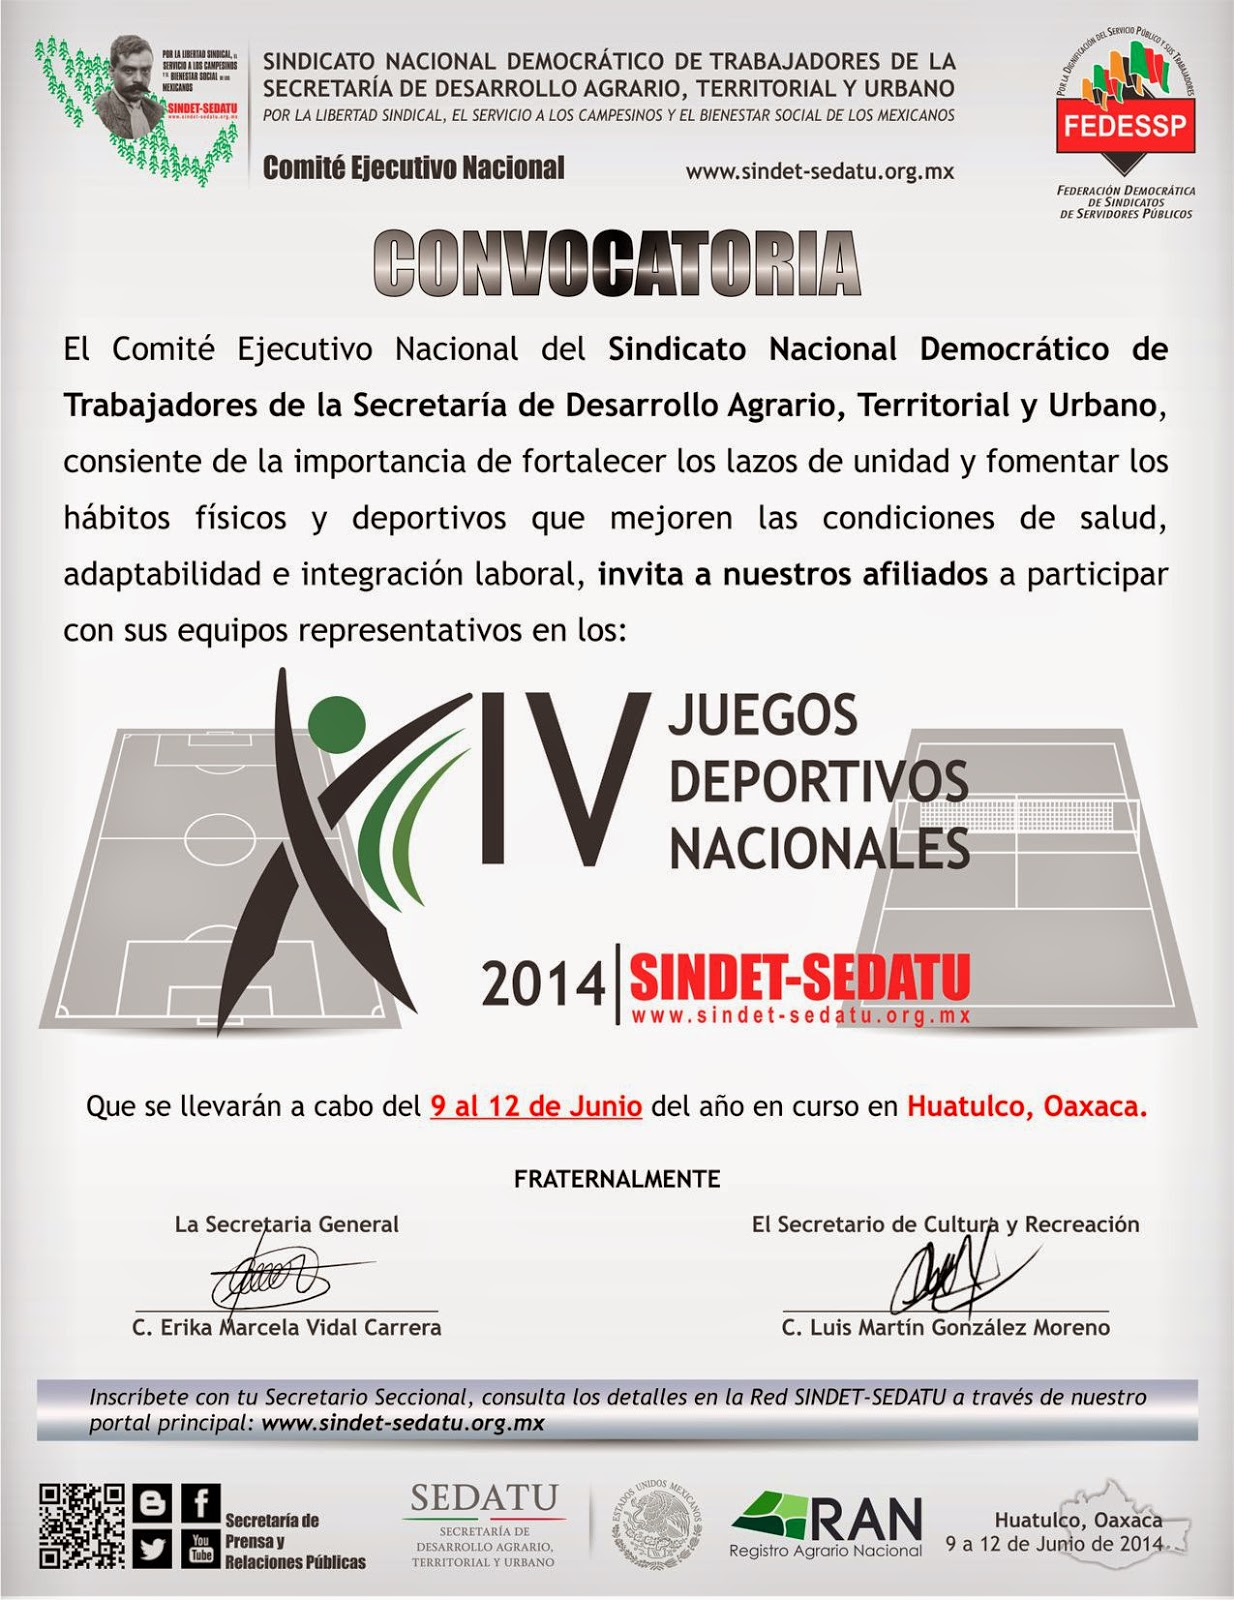 http://sindet-sedatu.org.mx/web/doctos/IV_JDN/IV%20JDN%20SINDET-SEDATU%20-%20Convocatoria%20.pdf